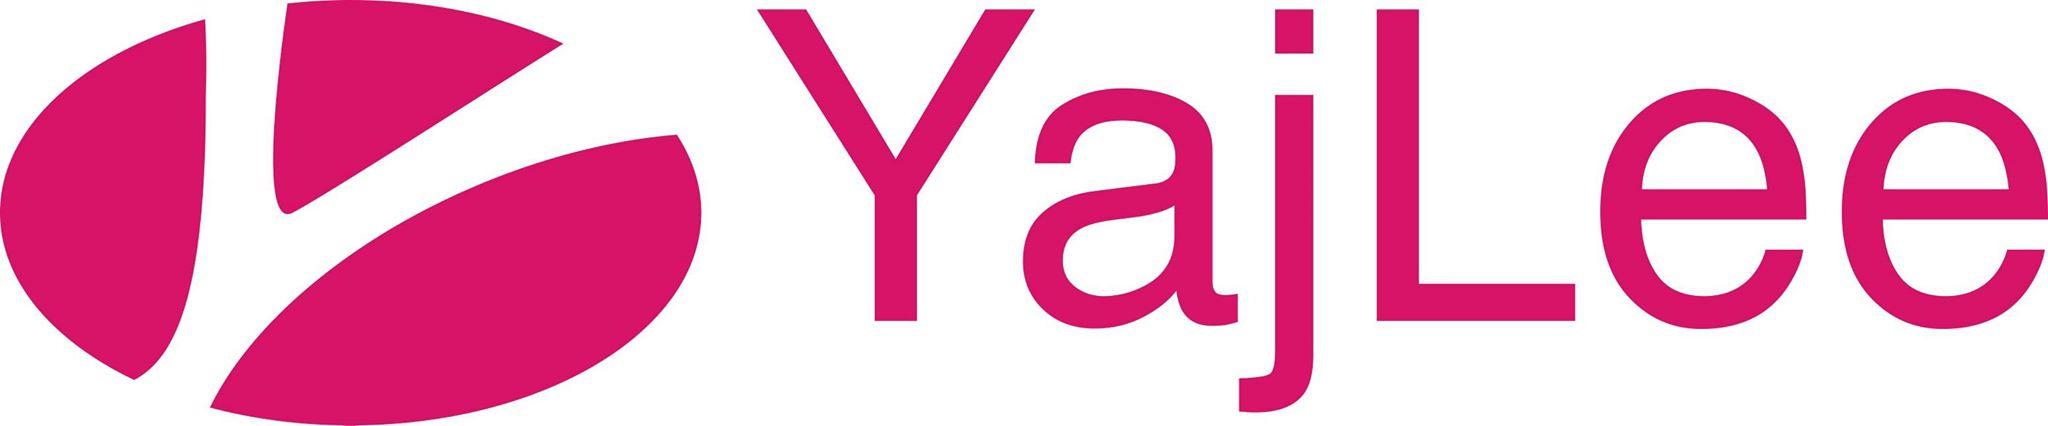 YajLee_logo